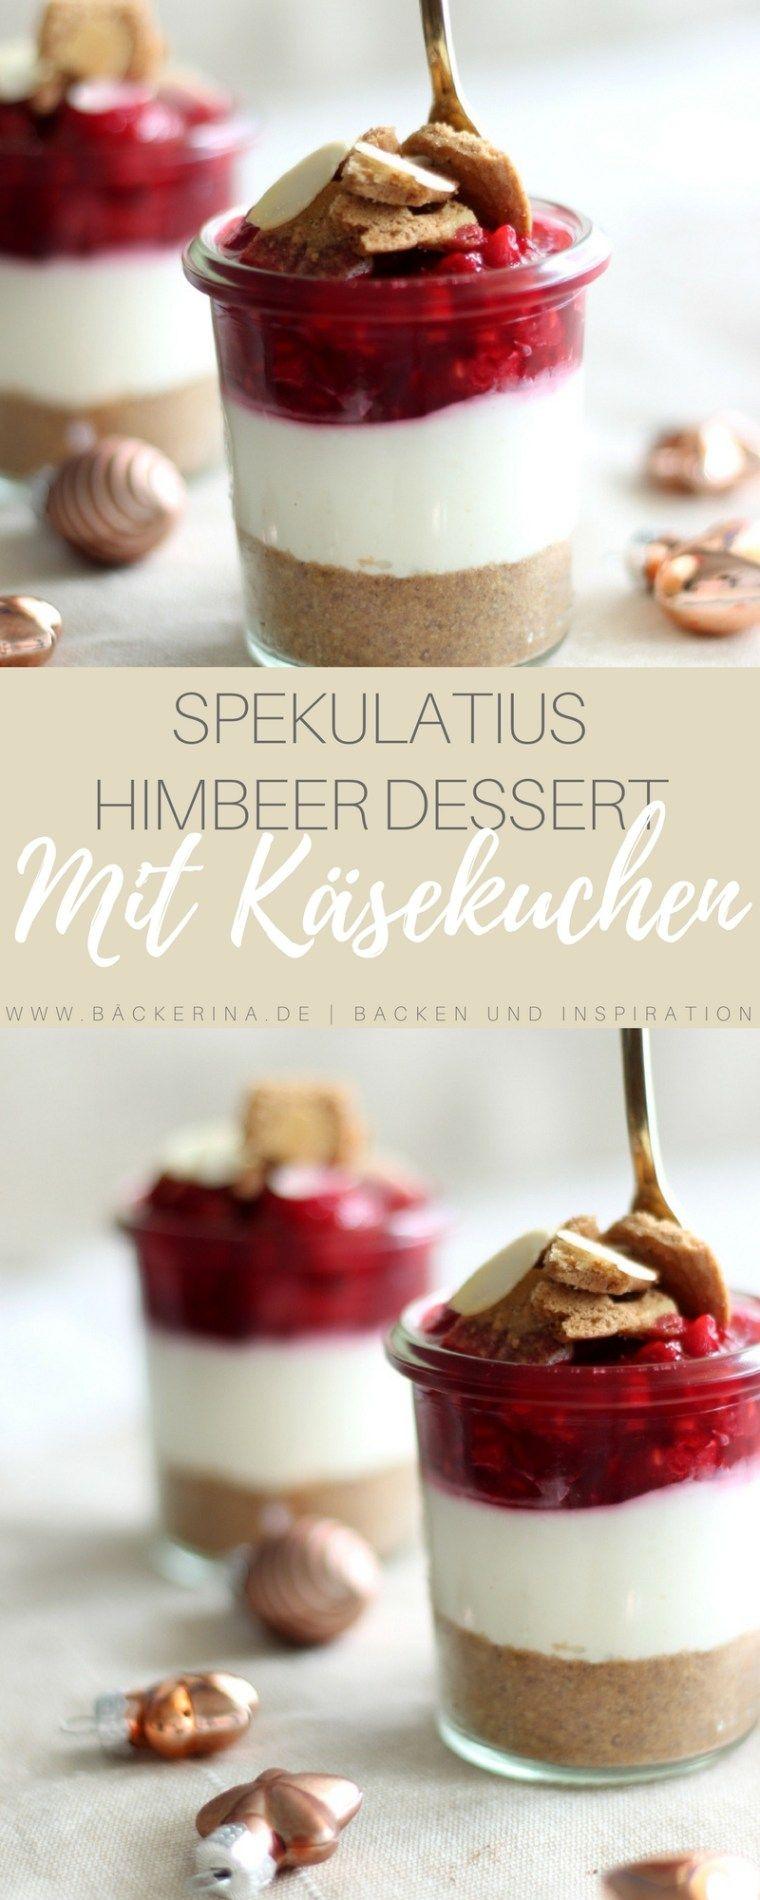 No bake Cheesecake im Glas - Spekulatius & Himbeer #easysimpledesserts